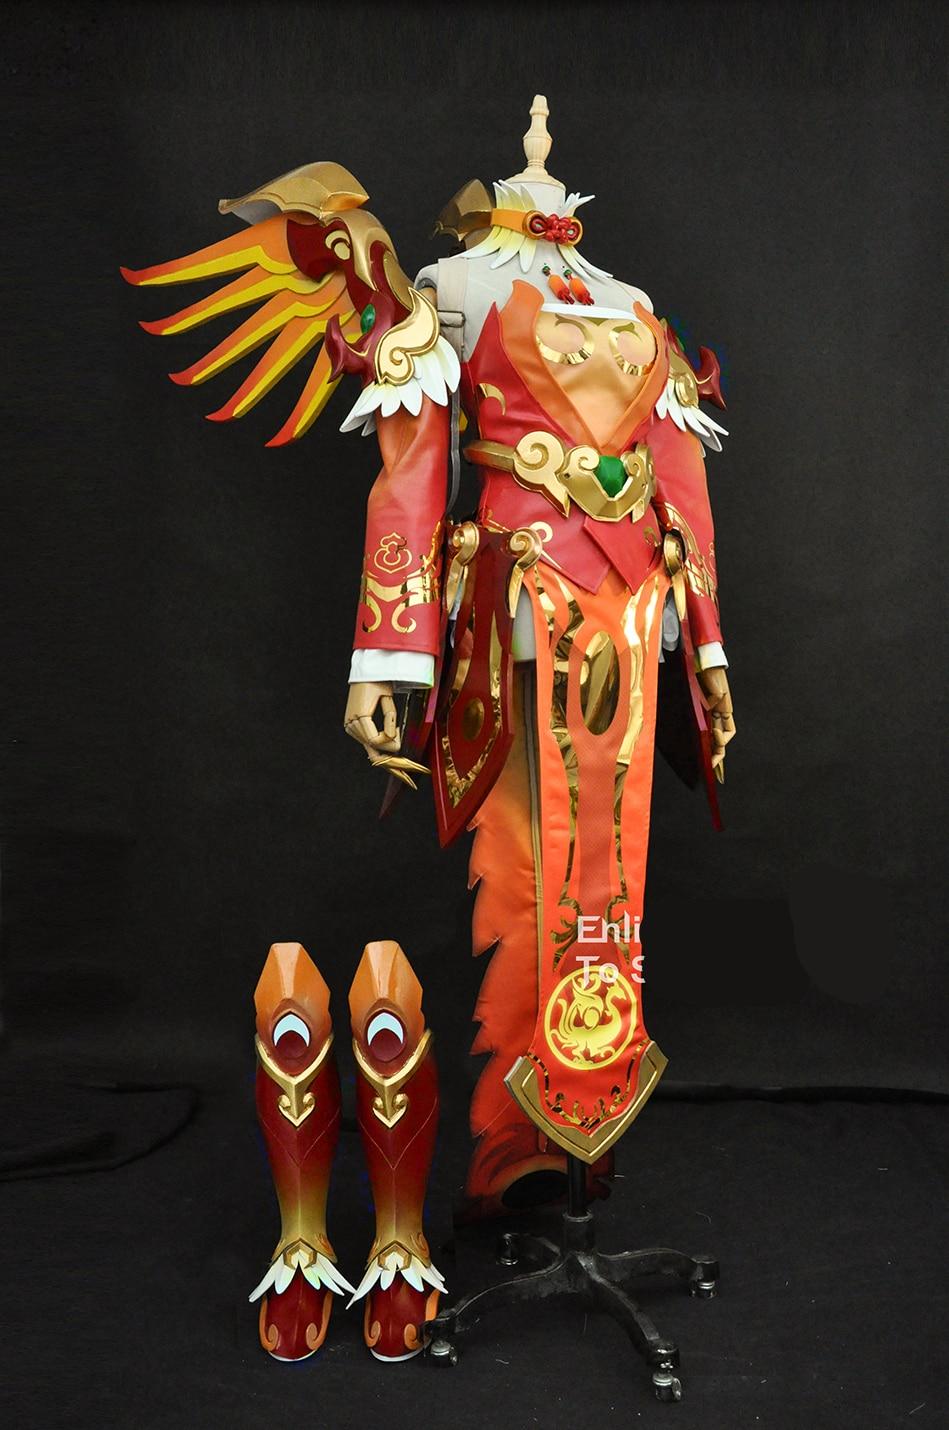 OW Mercy Angela Ziegler Mercy new skin Suzaku mercy cosplay costume custom made/size Full Set mercy outfit and prop 1